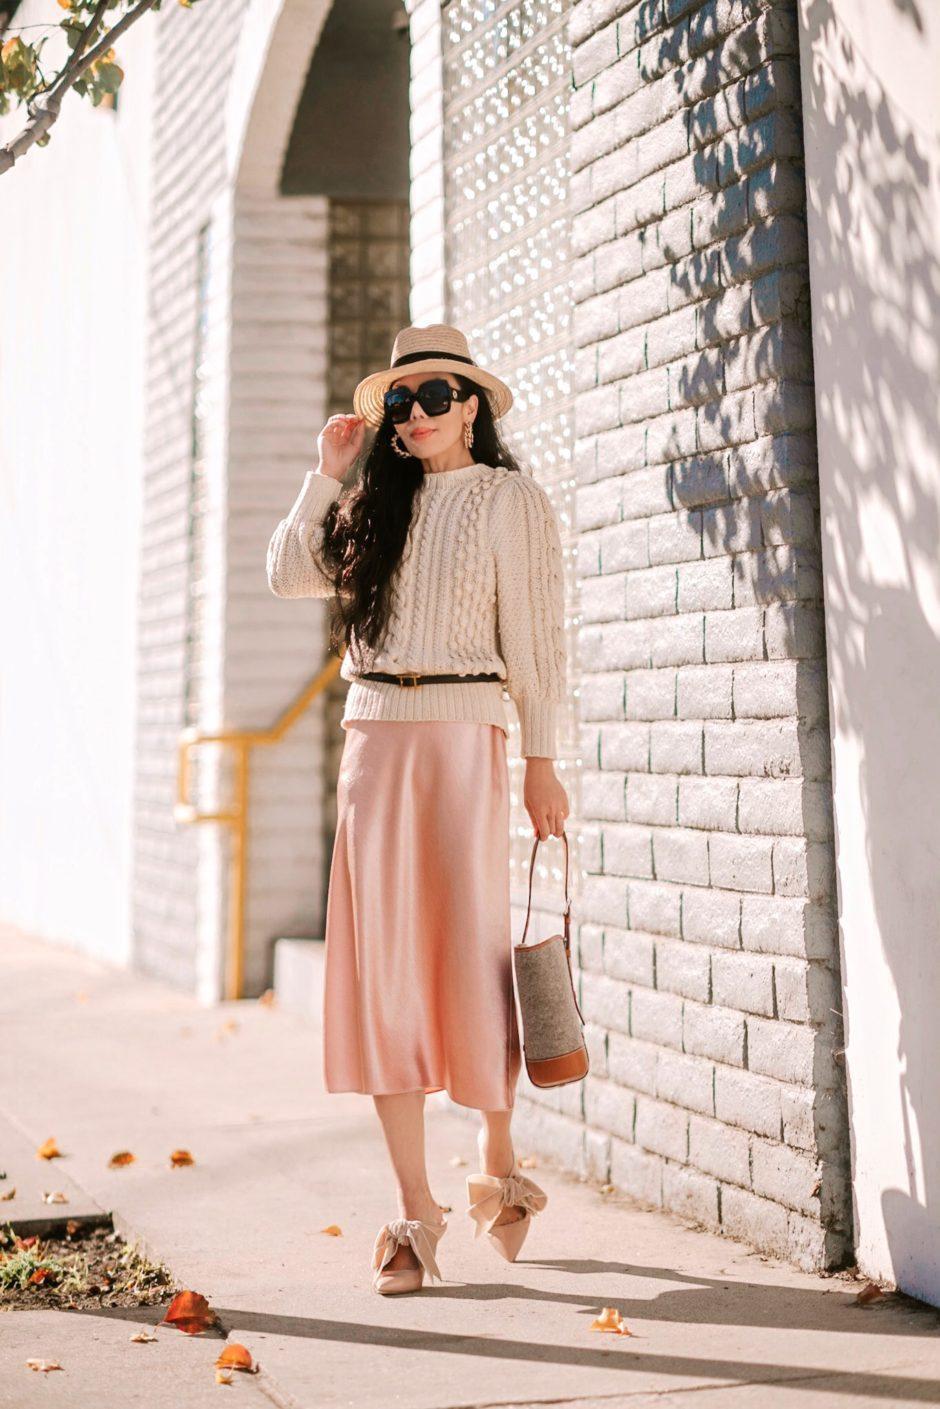 hallie daily blogger hat bag belt sunglasses jewels satin dress beige sweater bow shoes